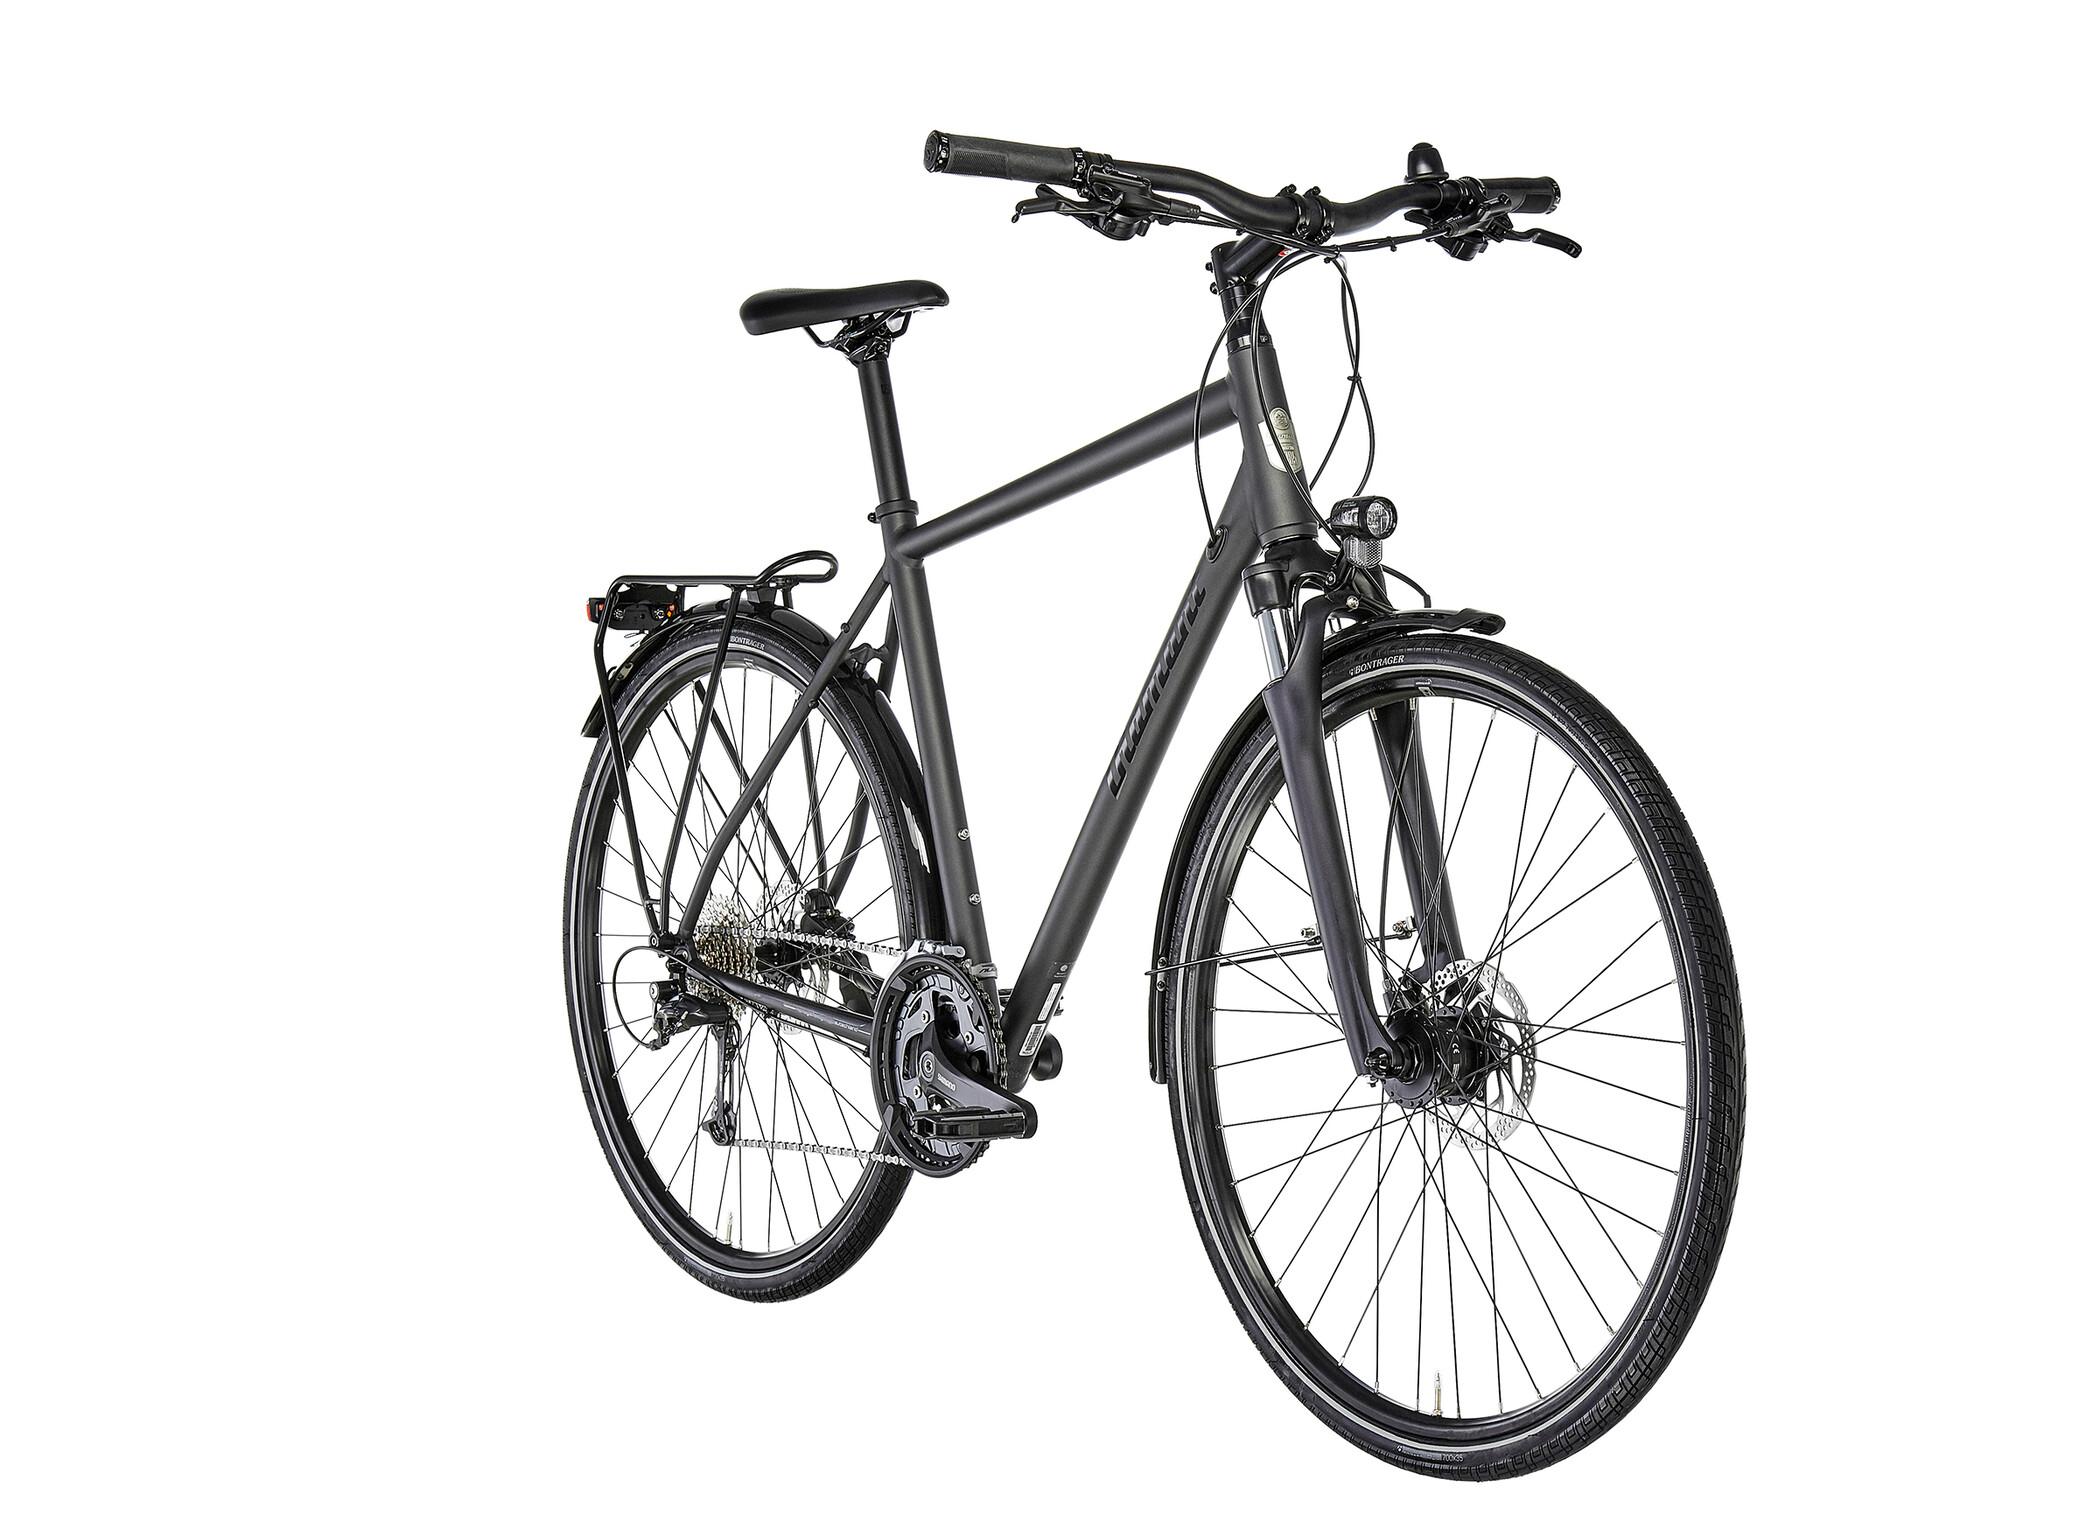 Diamant Ubari günstig kaufen | bikester.at